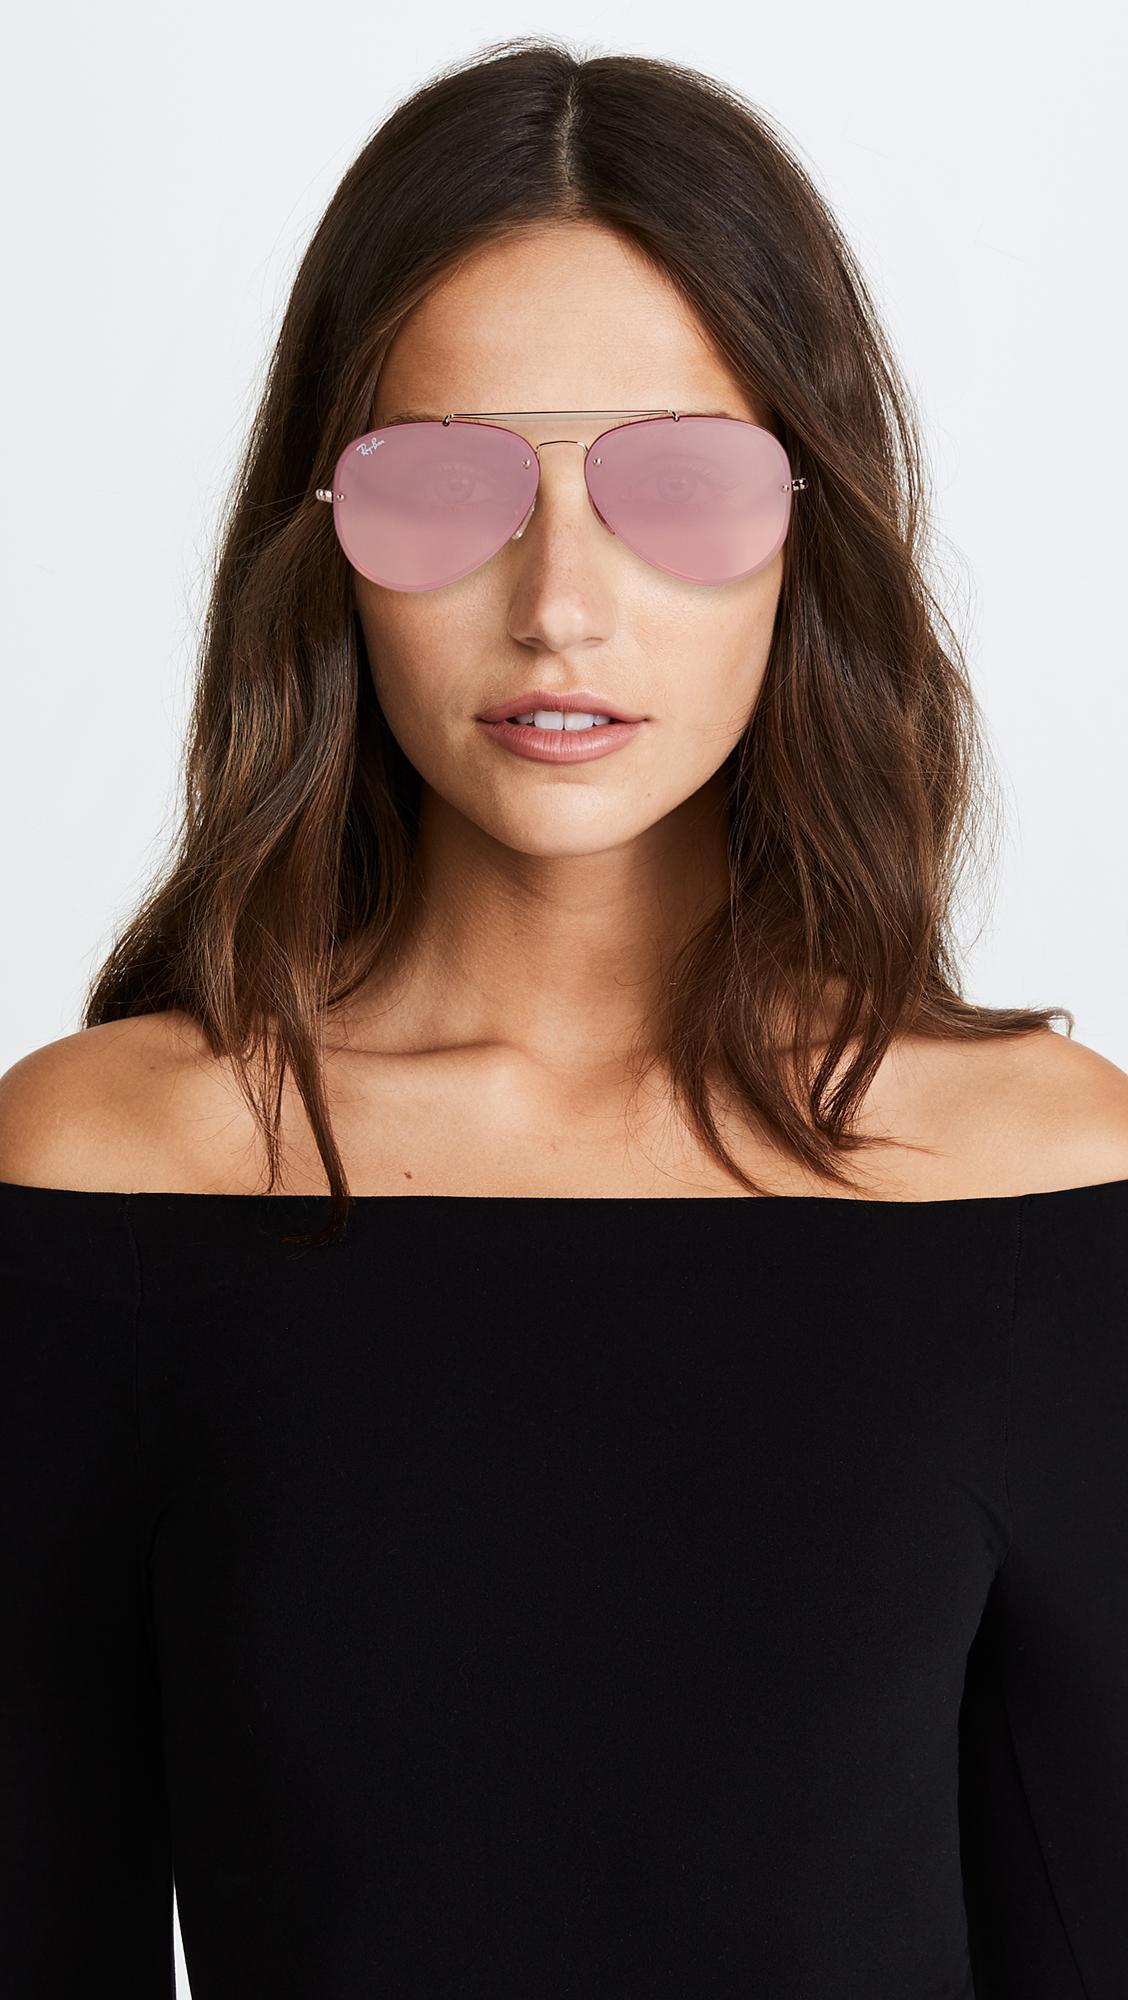 Ray-Ban Blaze Flat Lens Pilot Aviator Sunglasses in Gold/Pink (Pink)